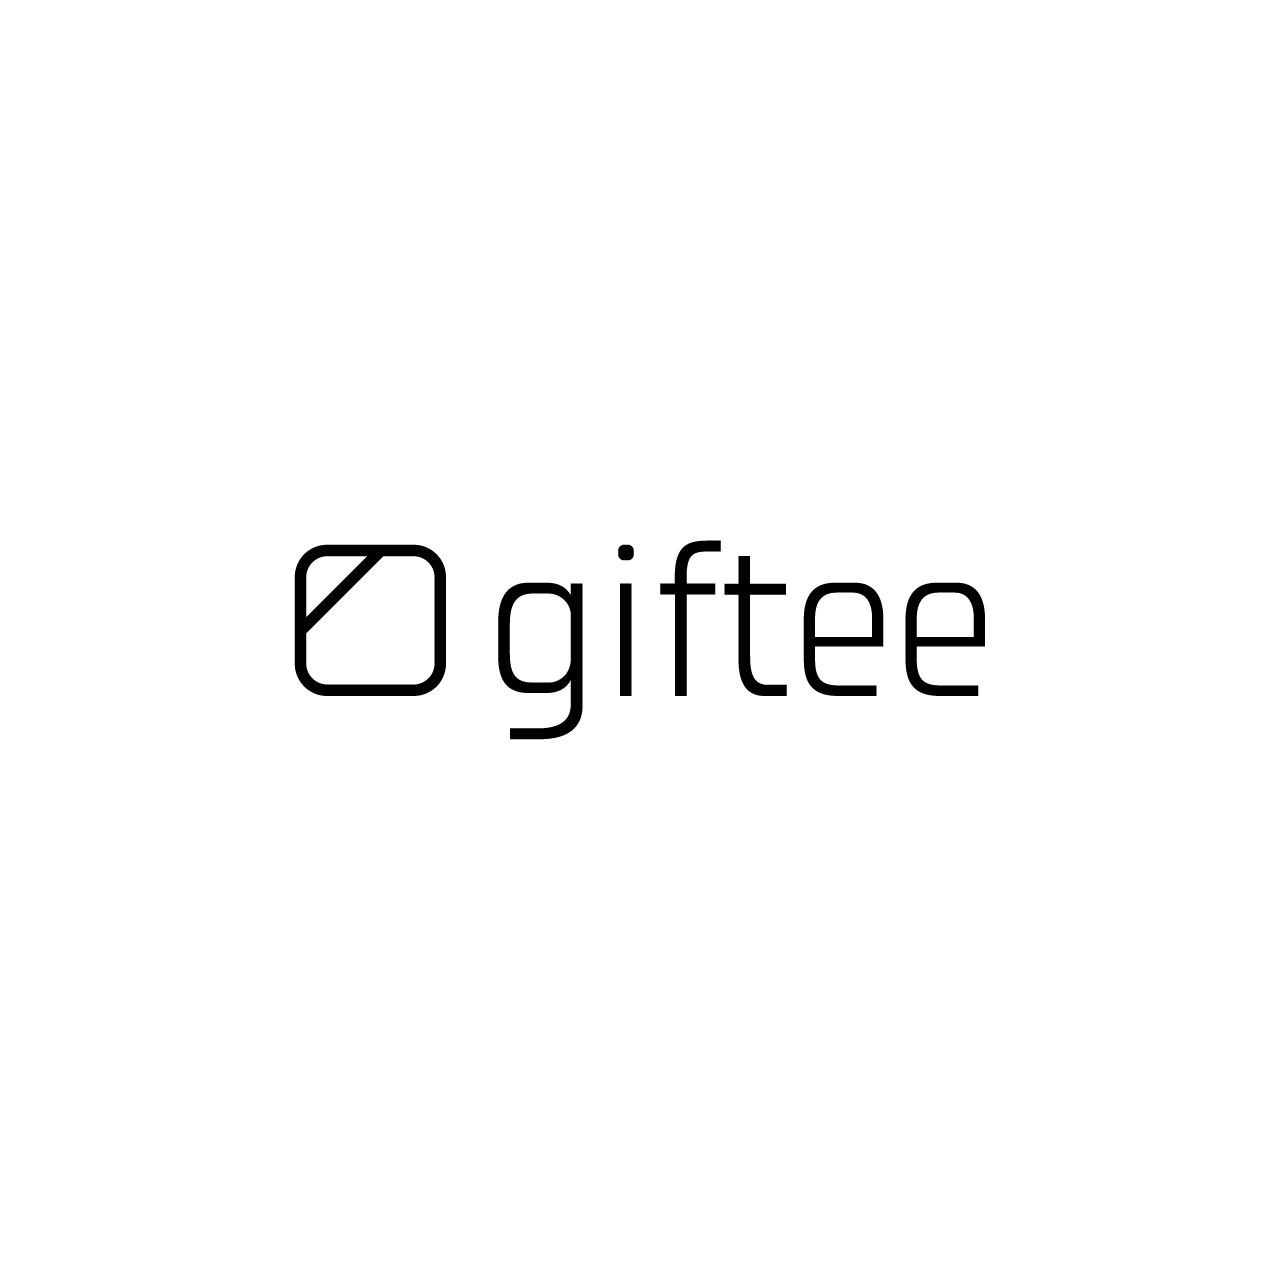 Logo square 1280x1280